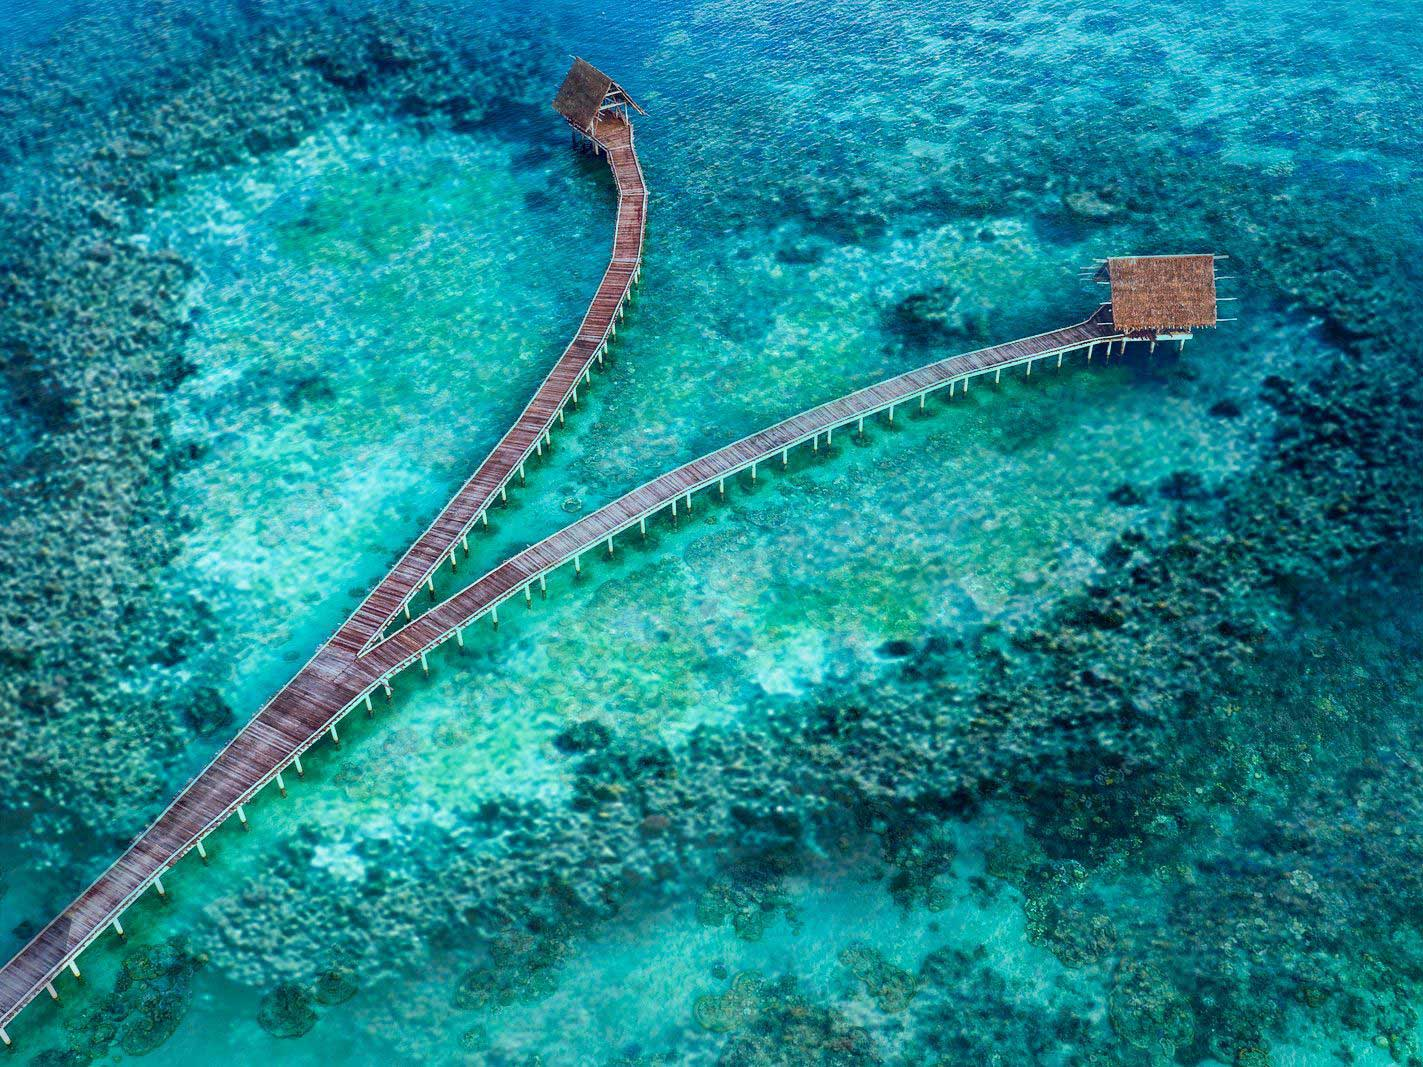 Kumpulan Pulau Pribadi Nan Cantik di Dunia, Ada yang Dari Indonesia!